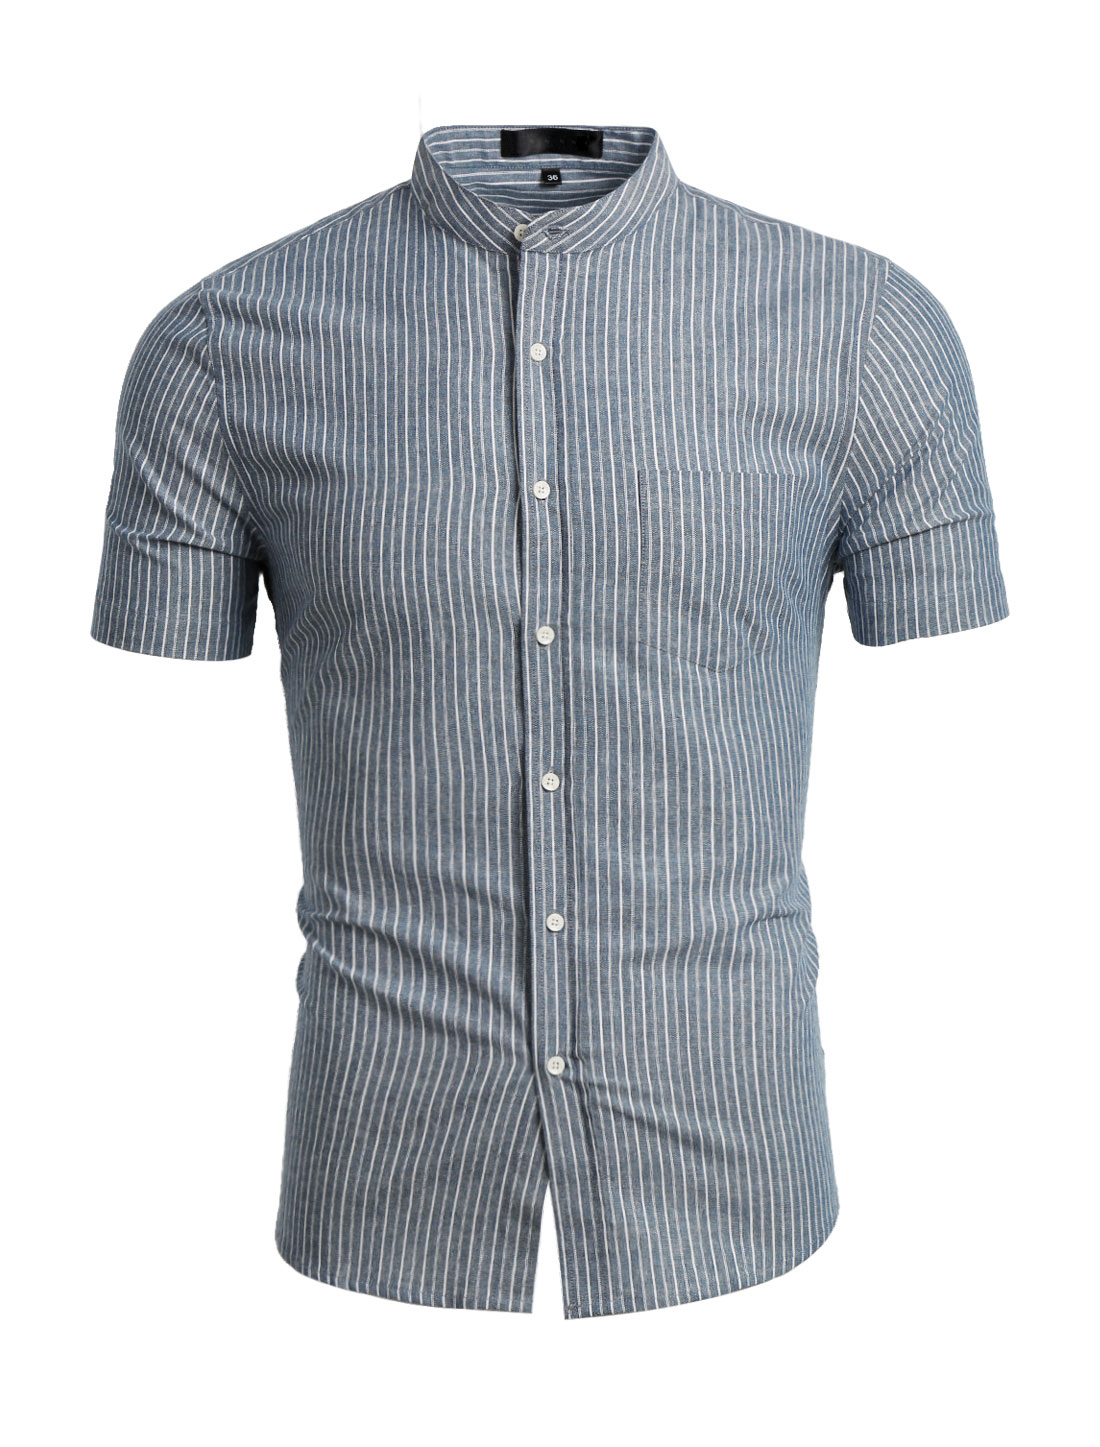 Men Banded Collar Short Sleeves Stripes Pattern Shirt Gray S